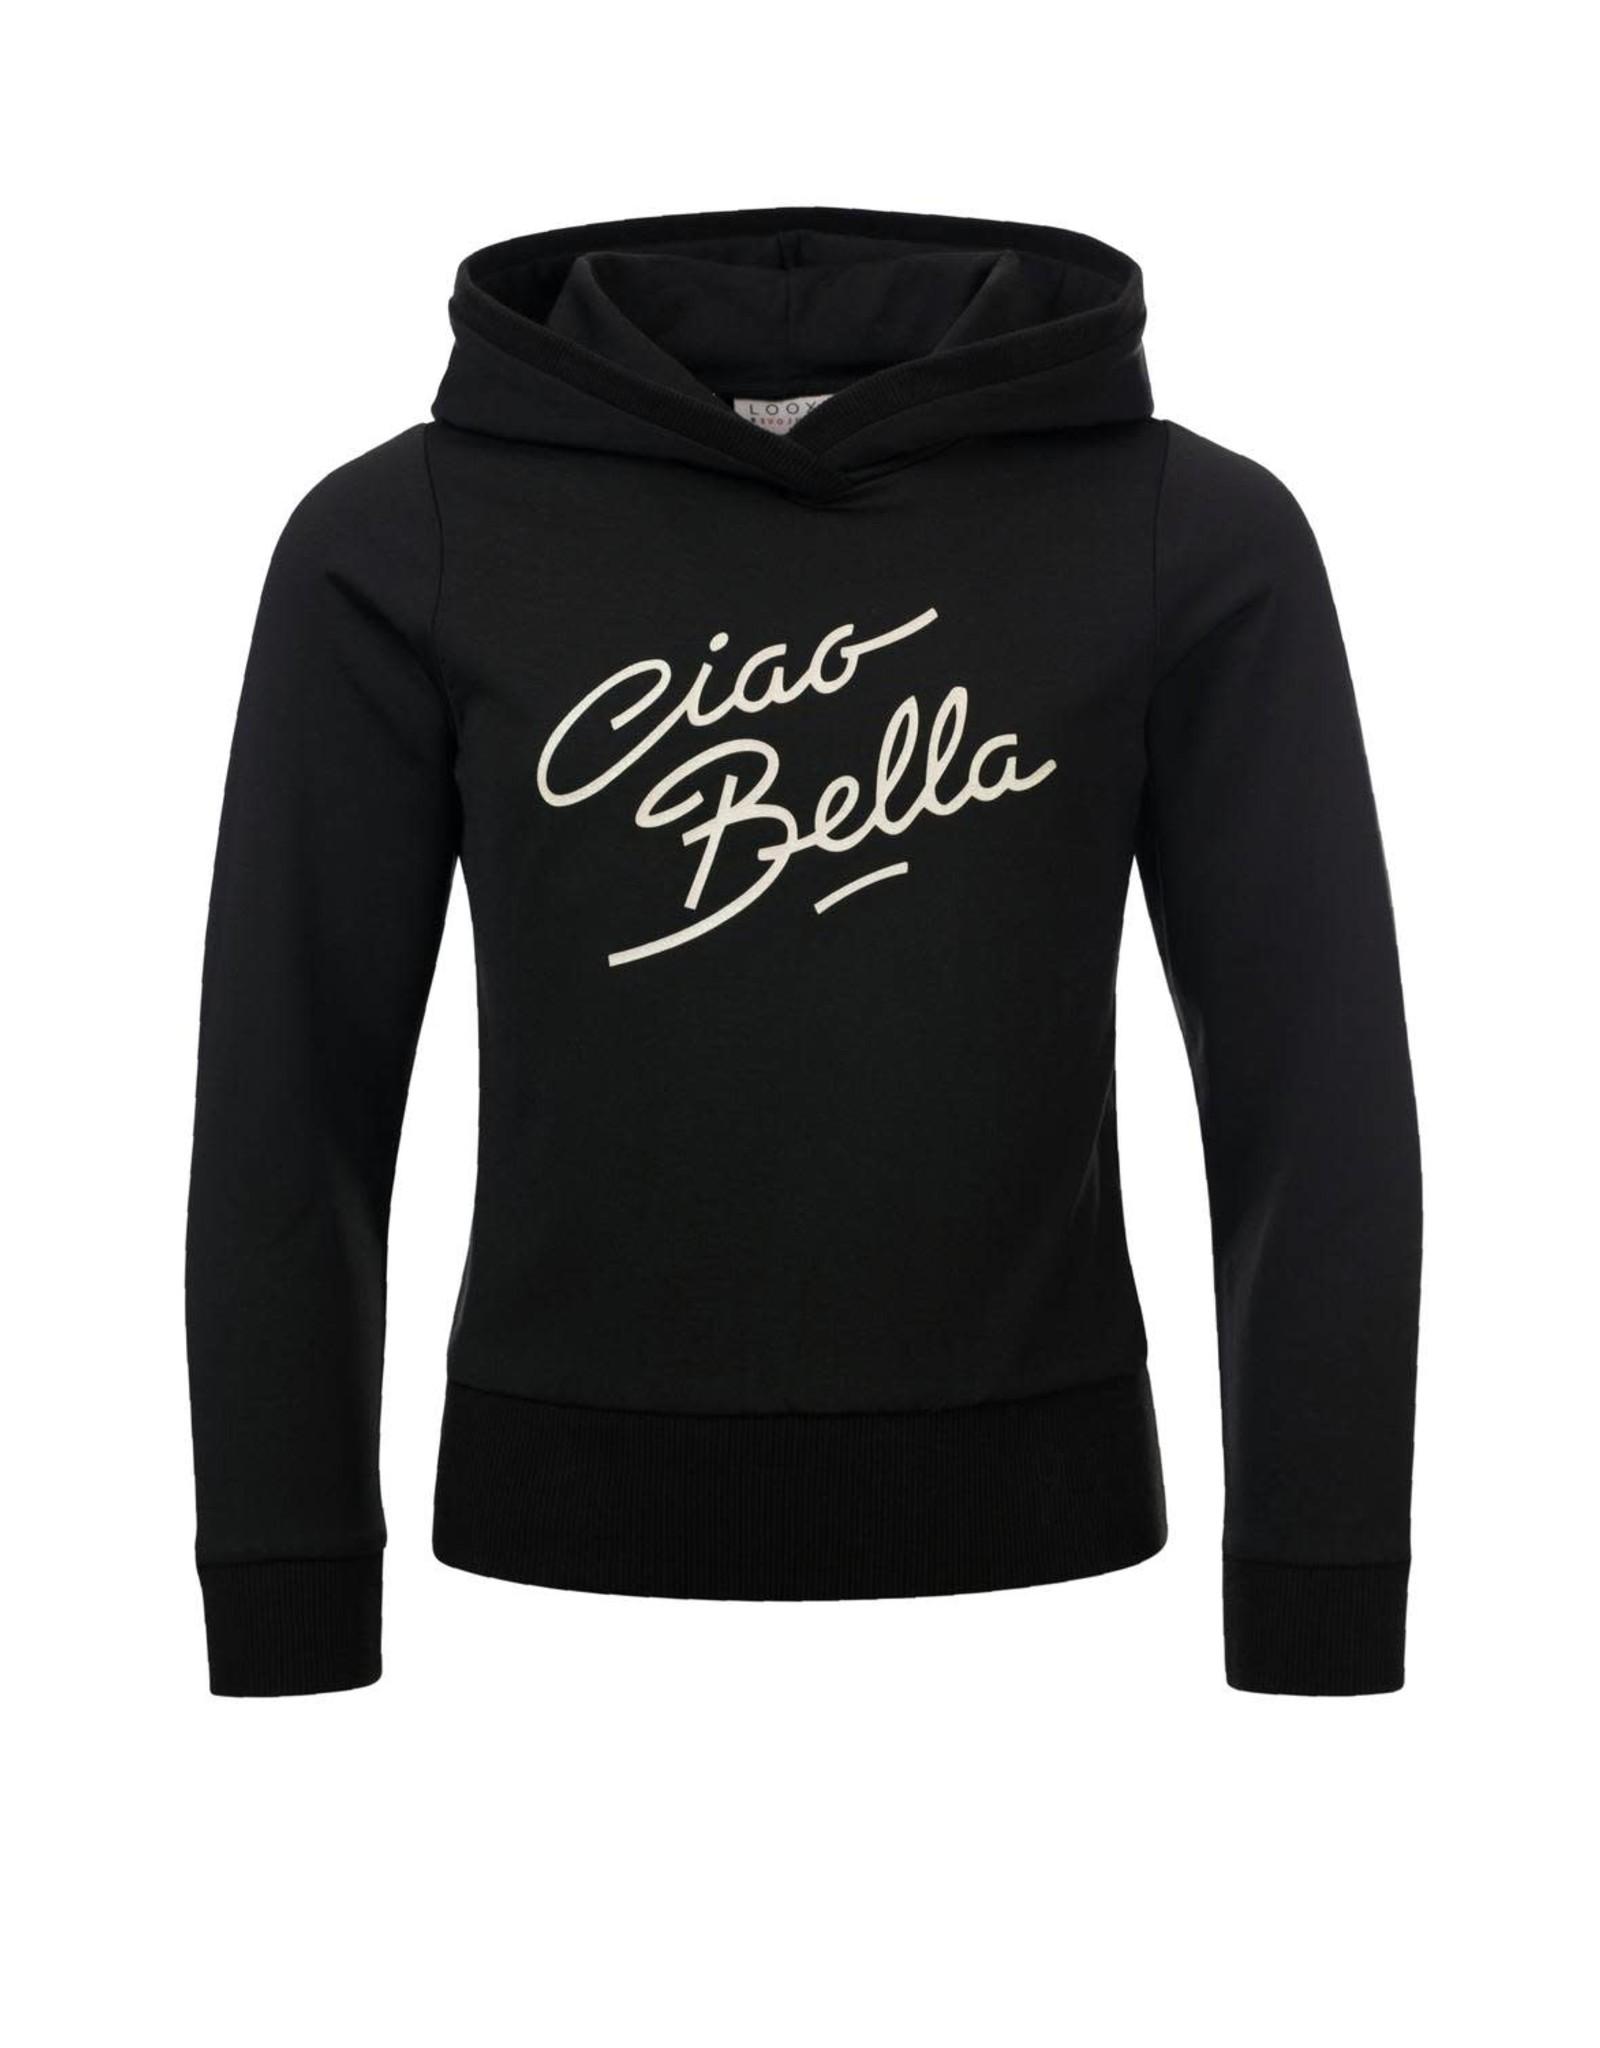 Looxs Girls hoody sweater Black